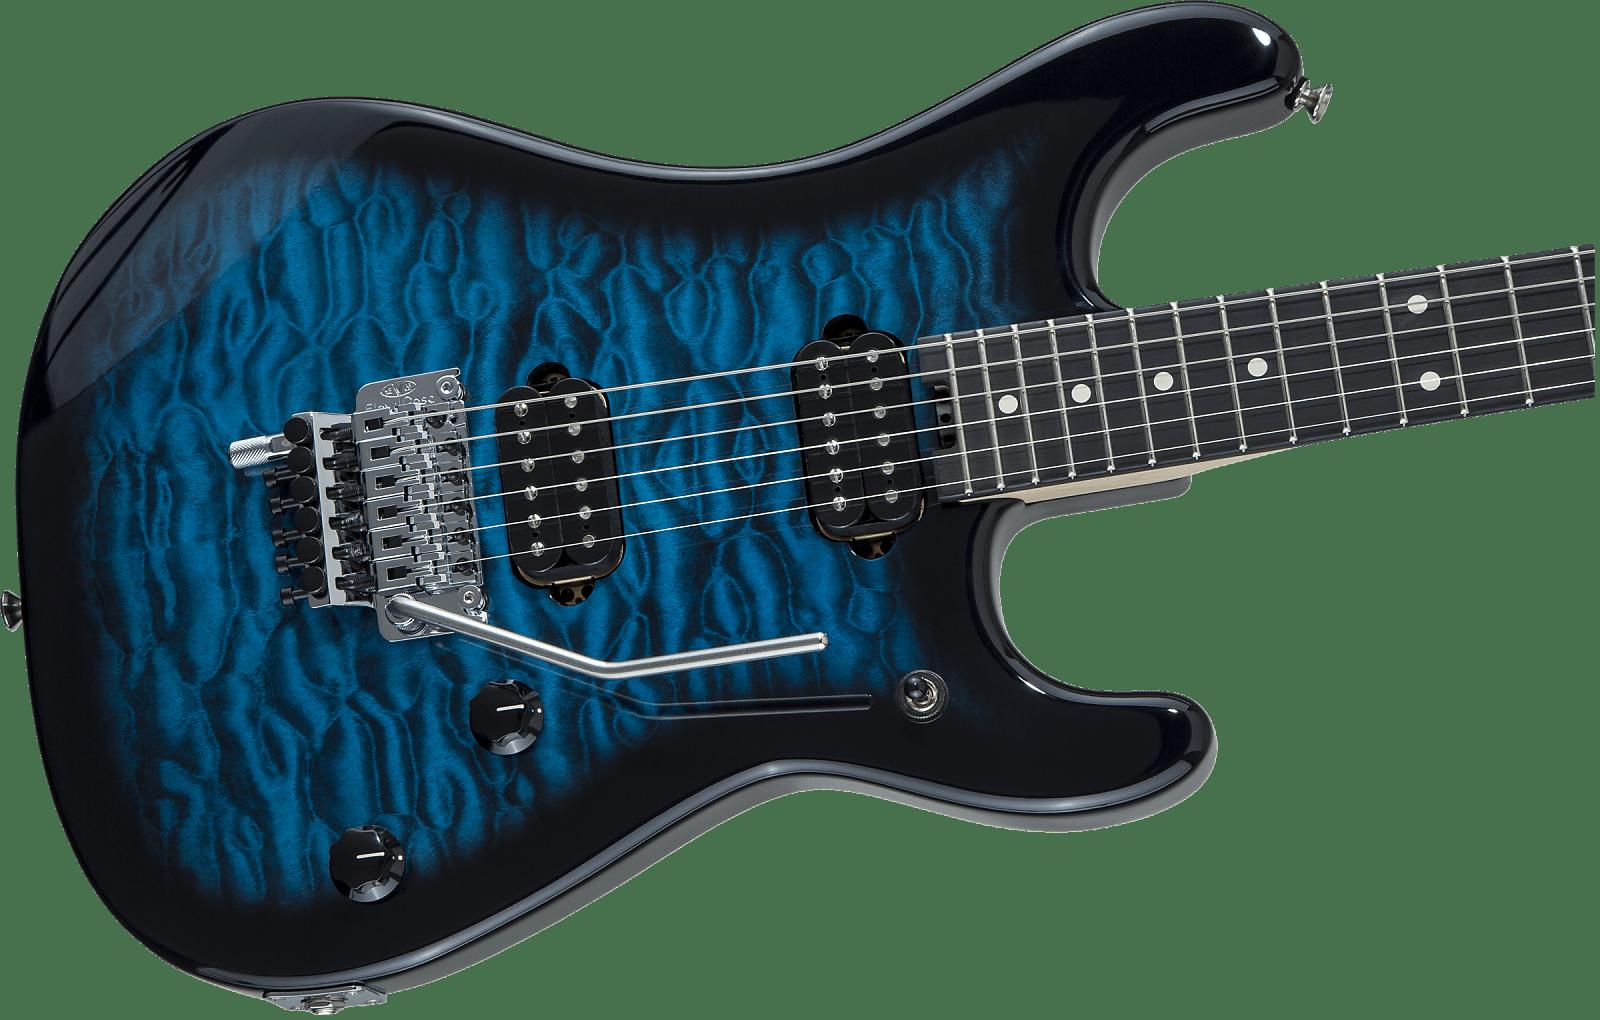 New 2019 Evh 5150 Series Deluxe Model Blue Burst Ebony Board Eddie Van Halen Authorized Dealer